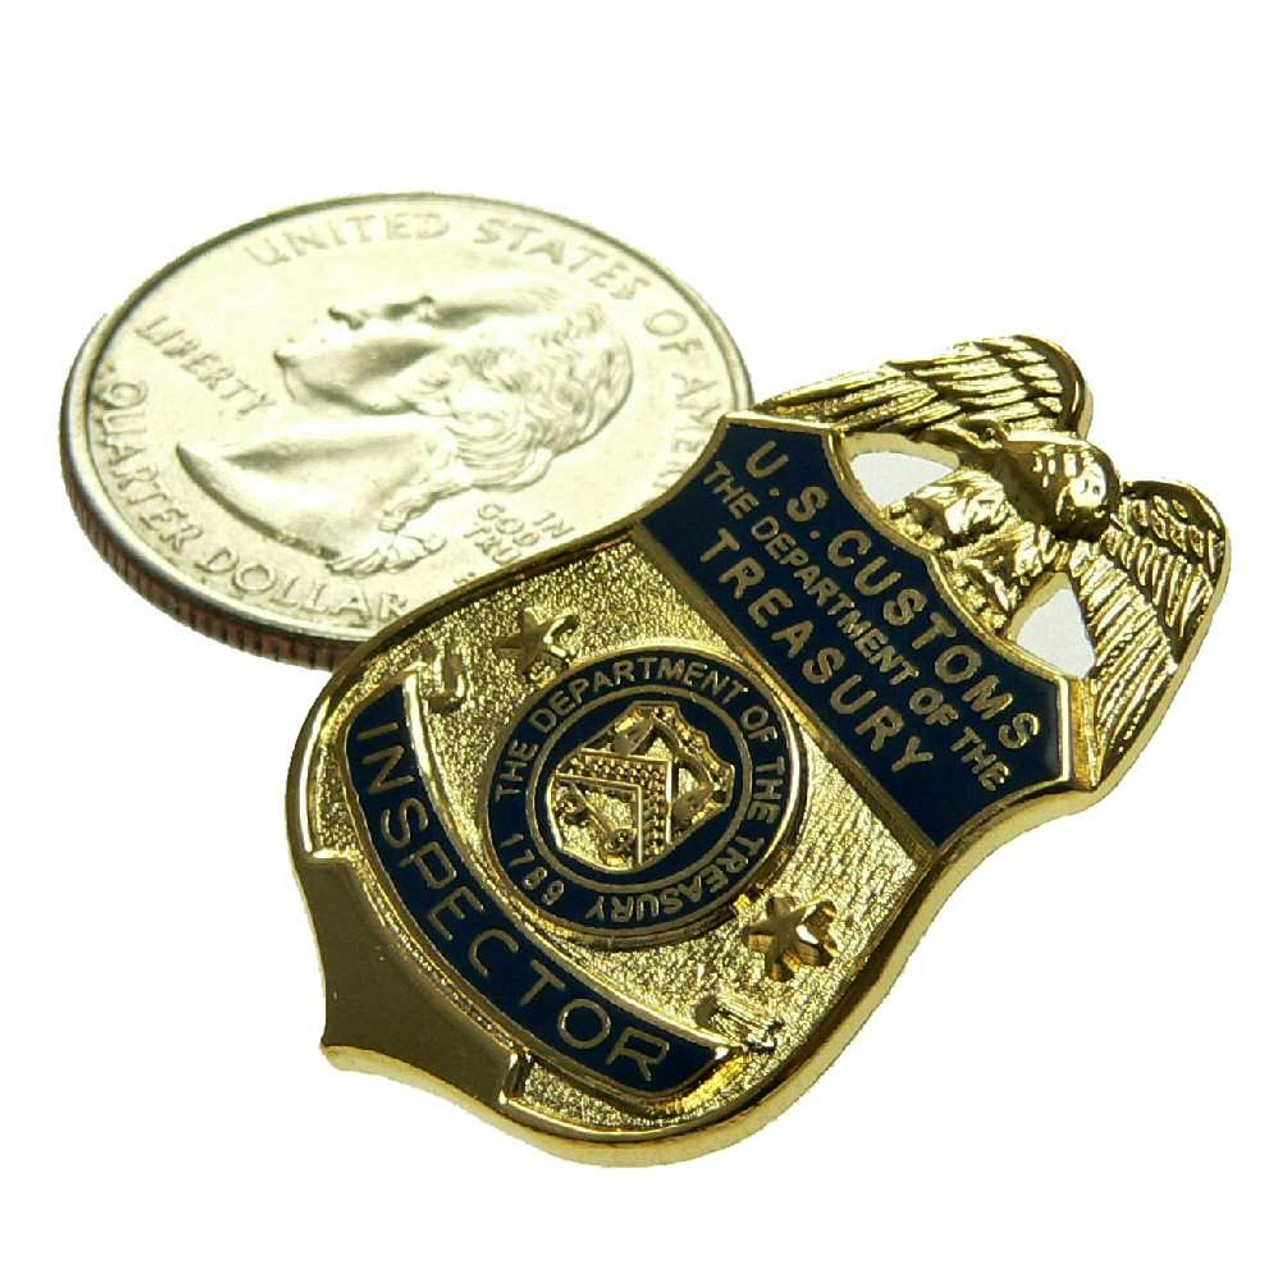 US U S Customs Inspector Mini Badge Patch Commemorative 2 Pin Set